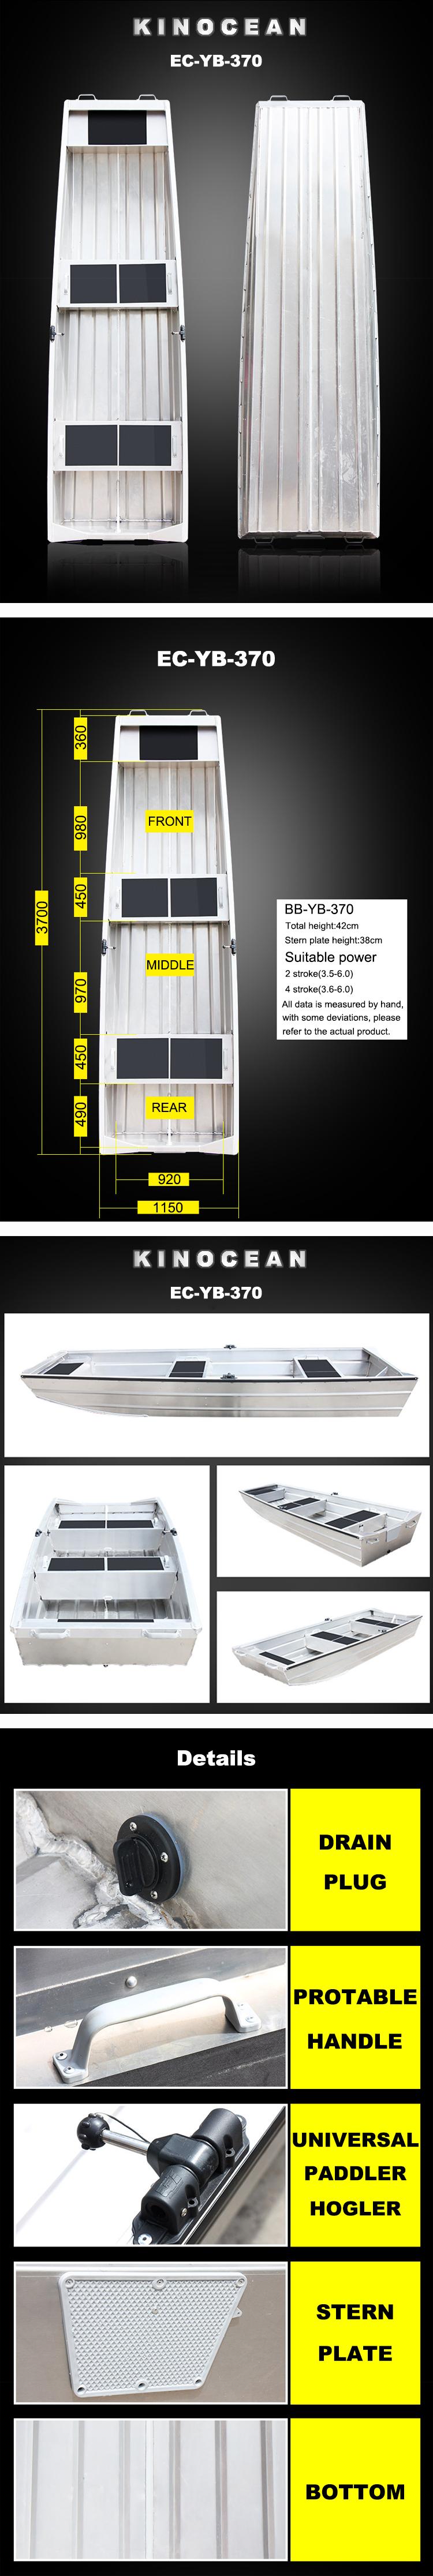 Kinocean 12ft Tất Cả Hàn Đáy Phẳng Nhôm Jon Thuyền